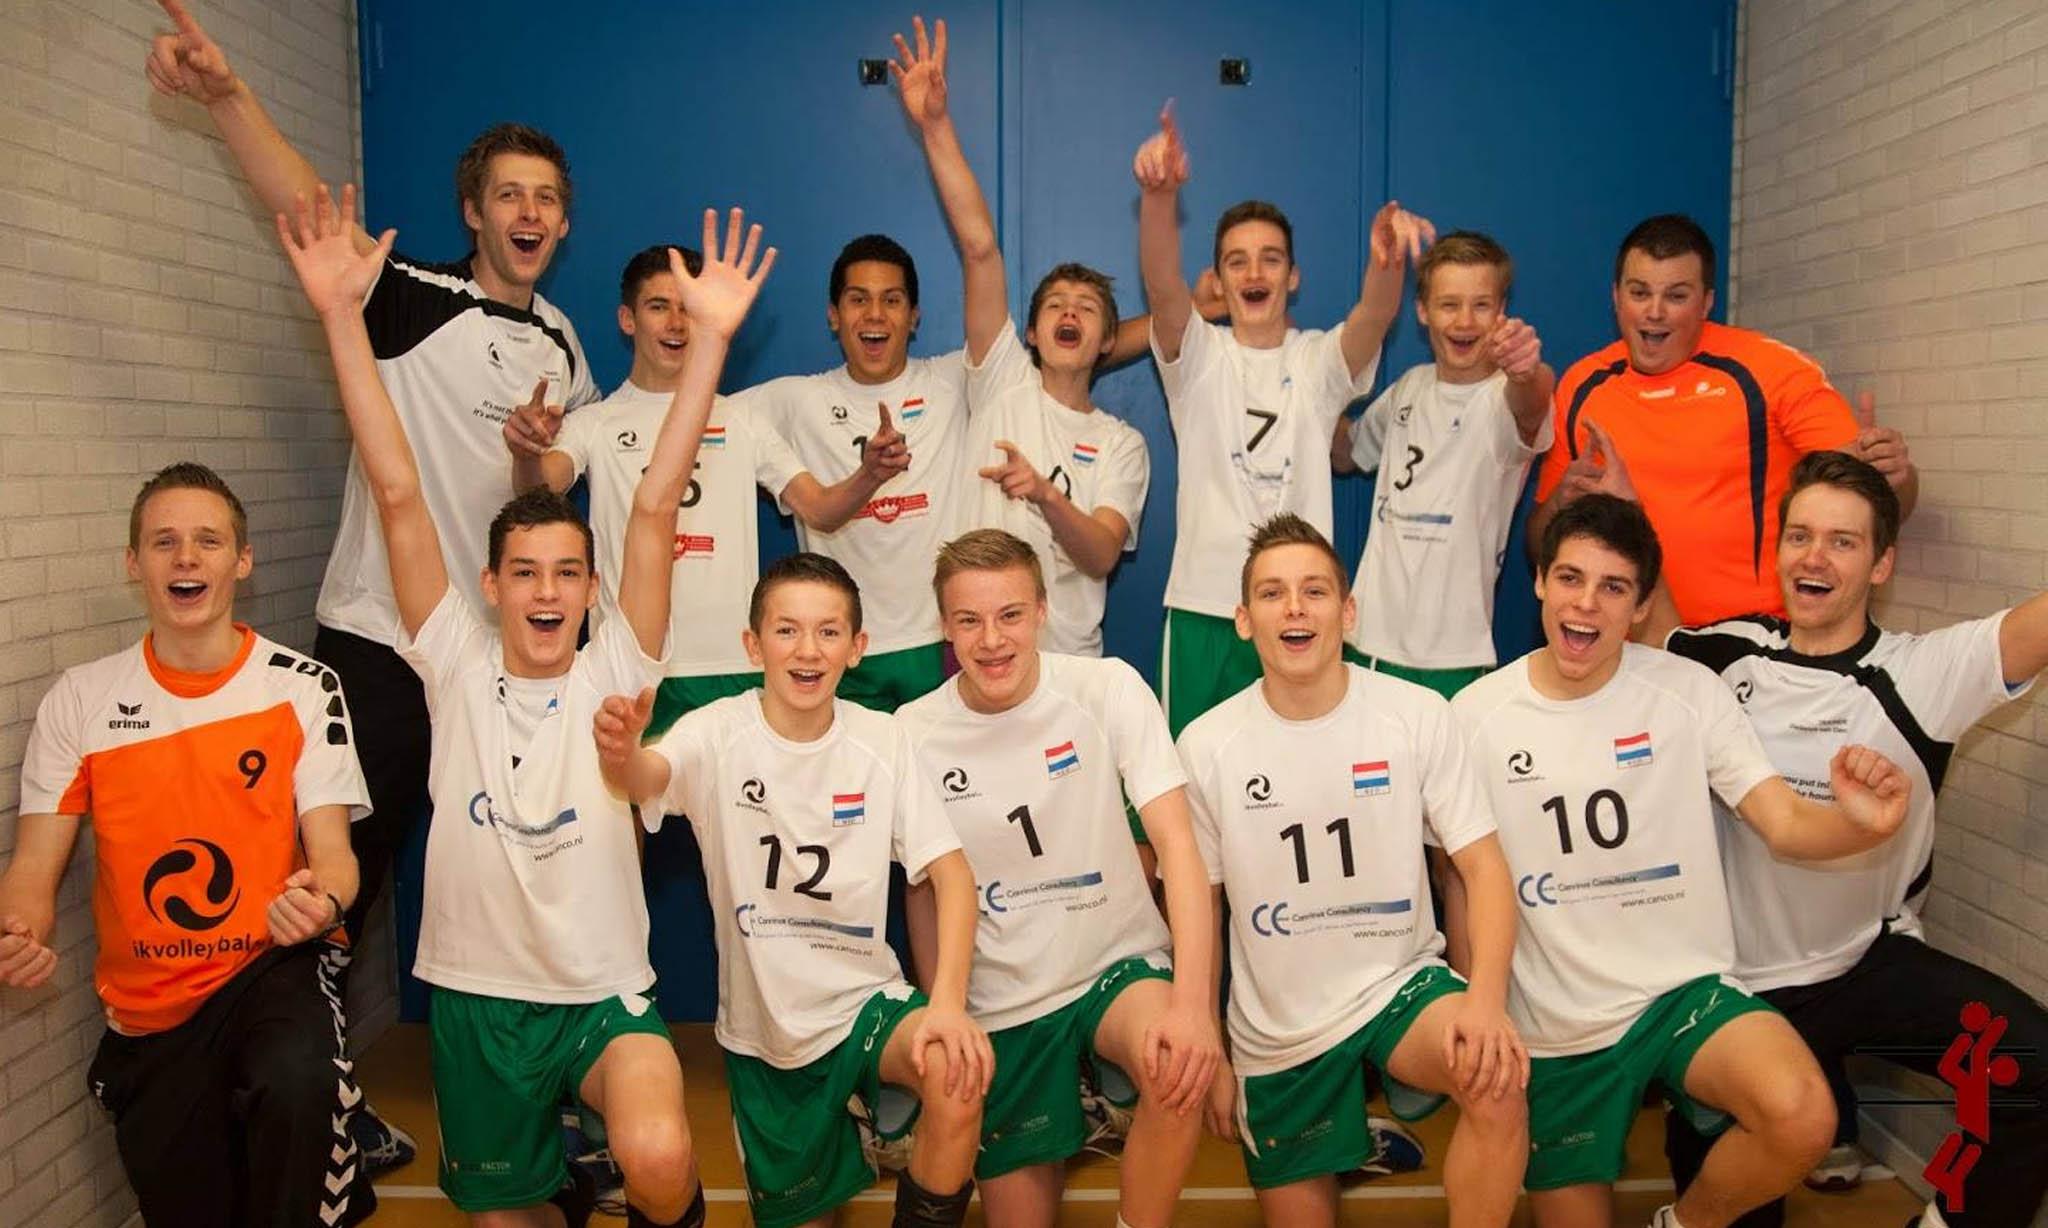 int-toernooi-apeldoorn-2013-5